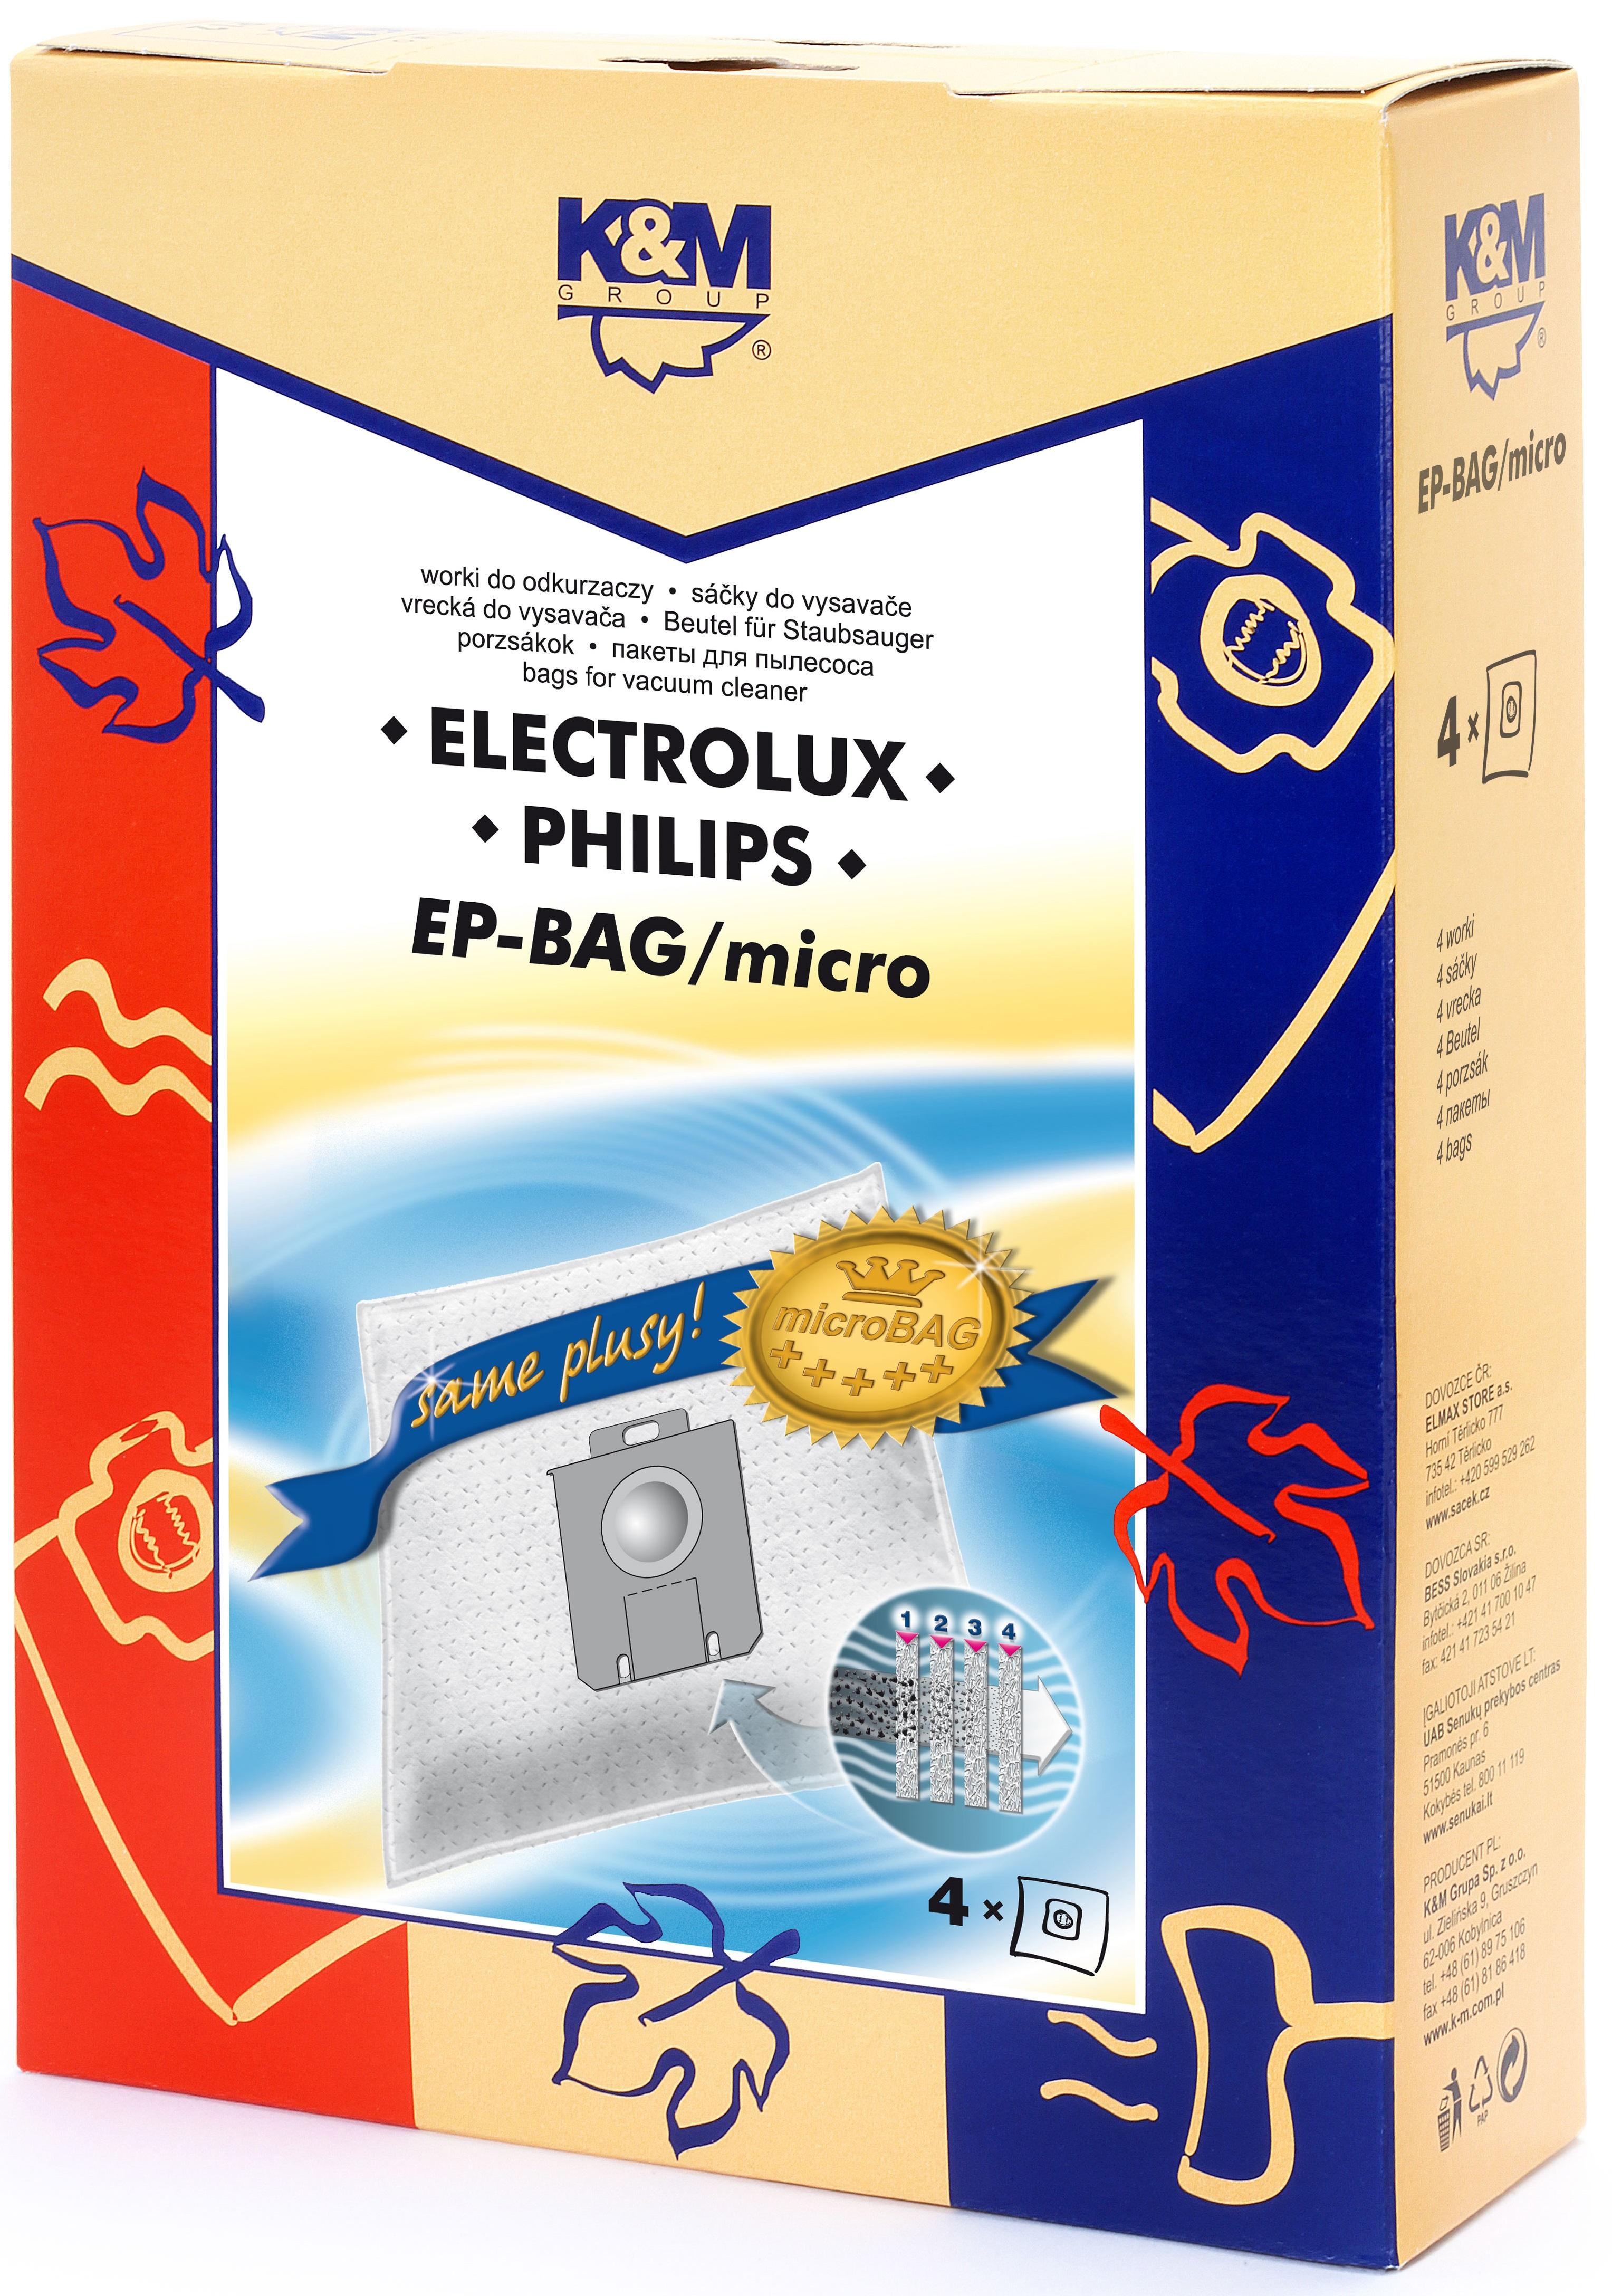 Sac aspirator Electrolux-Philips Universal (S-Bag), sintetic, 4x saci, K&M 0